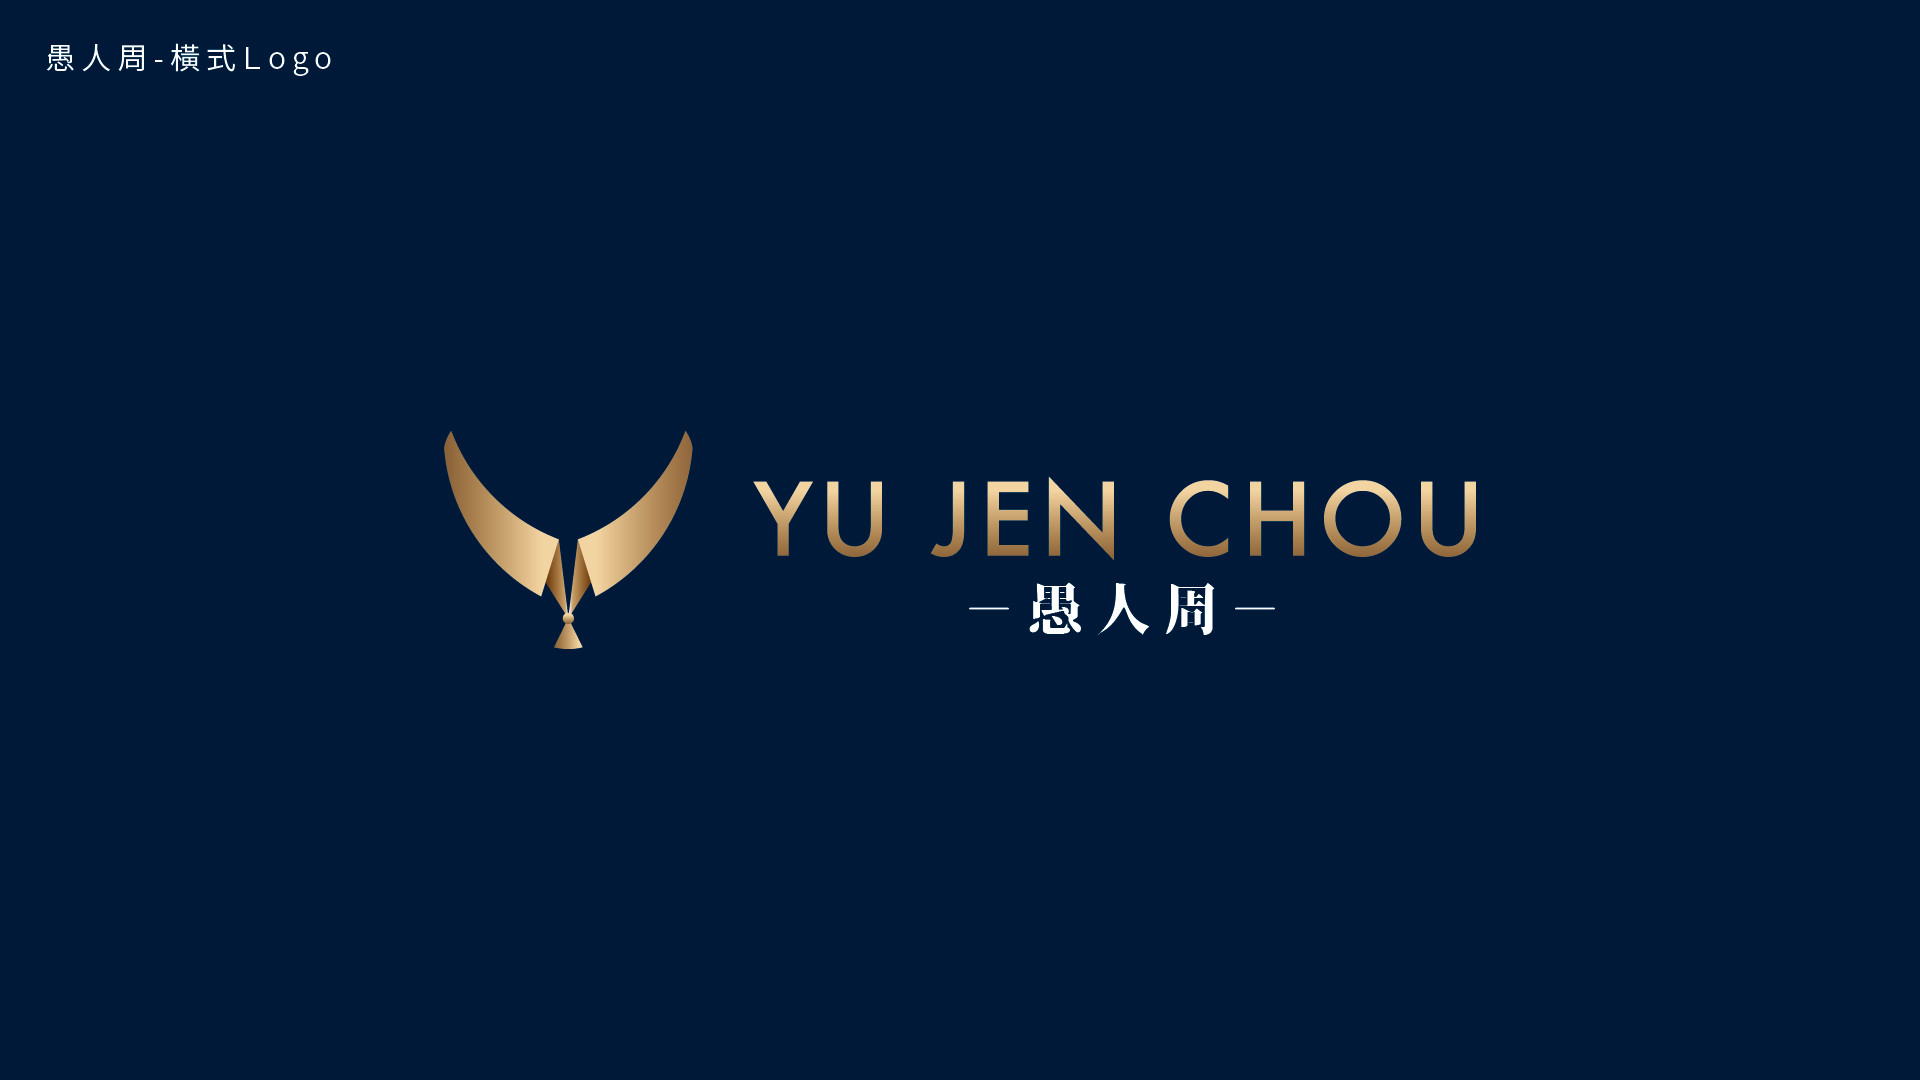 愚人周-Logo-2整-05.jpg